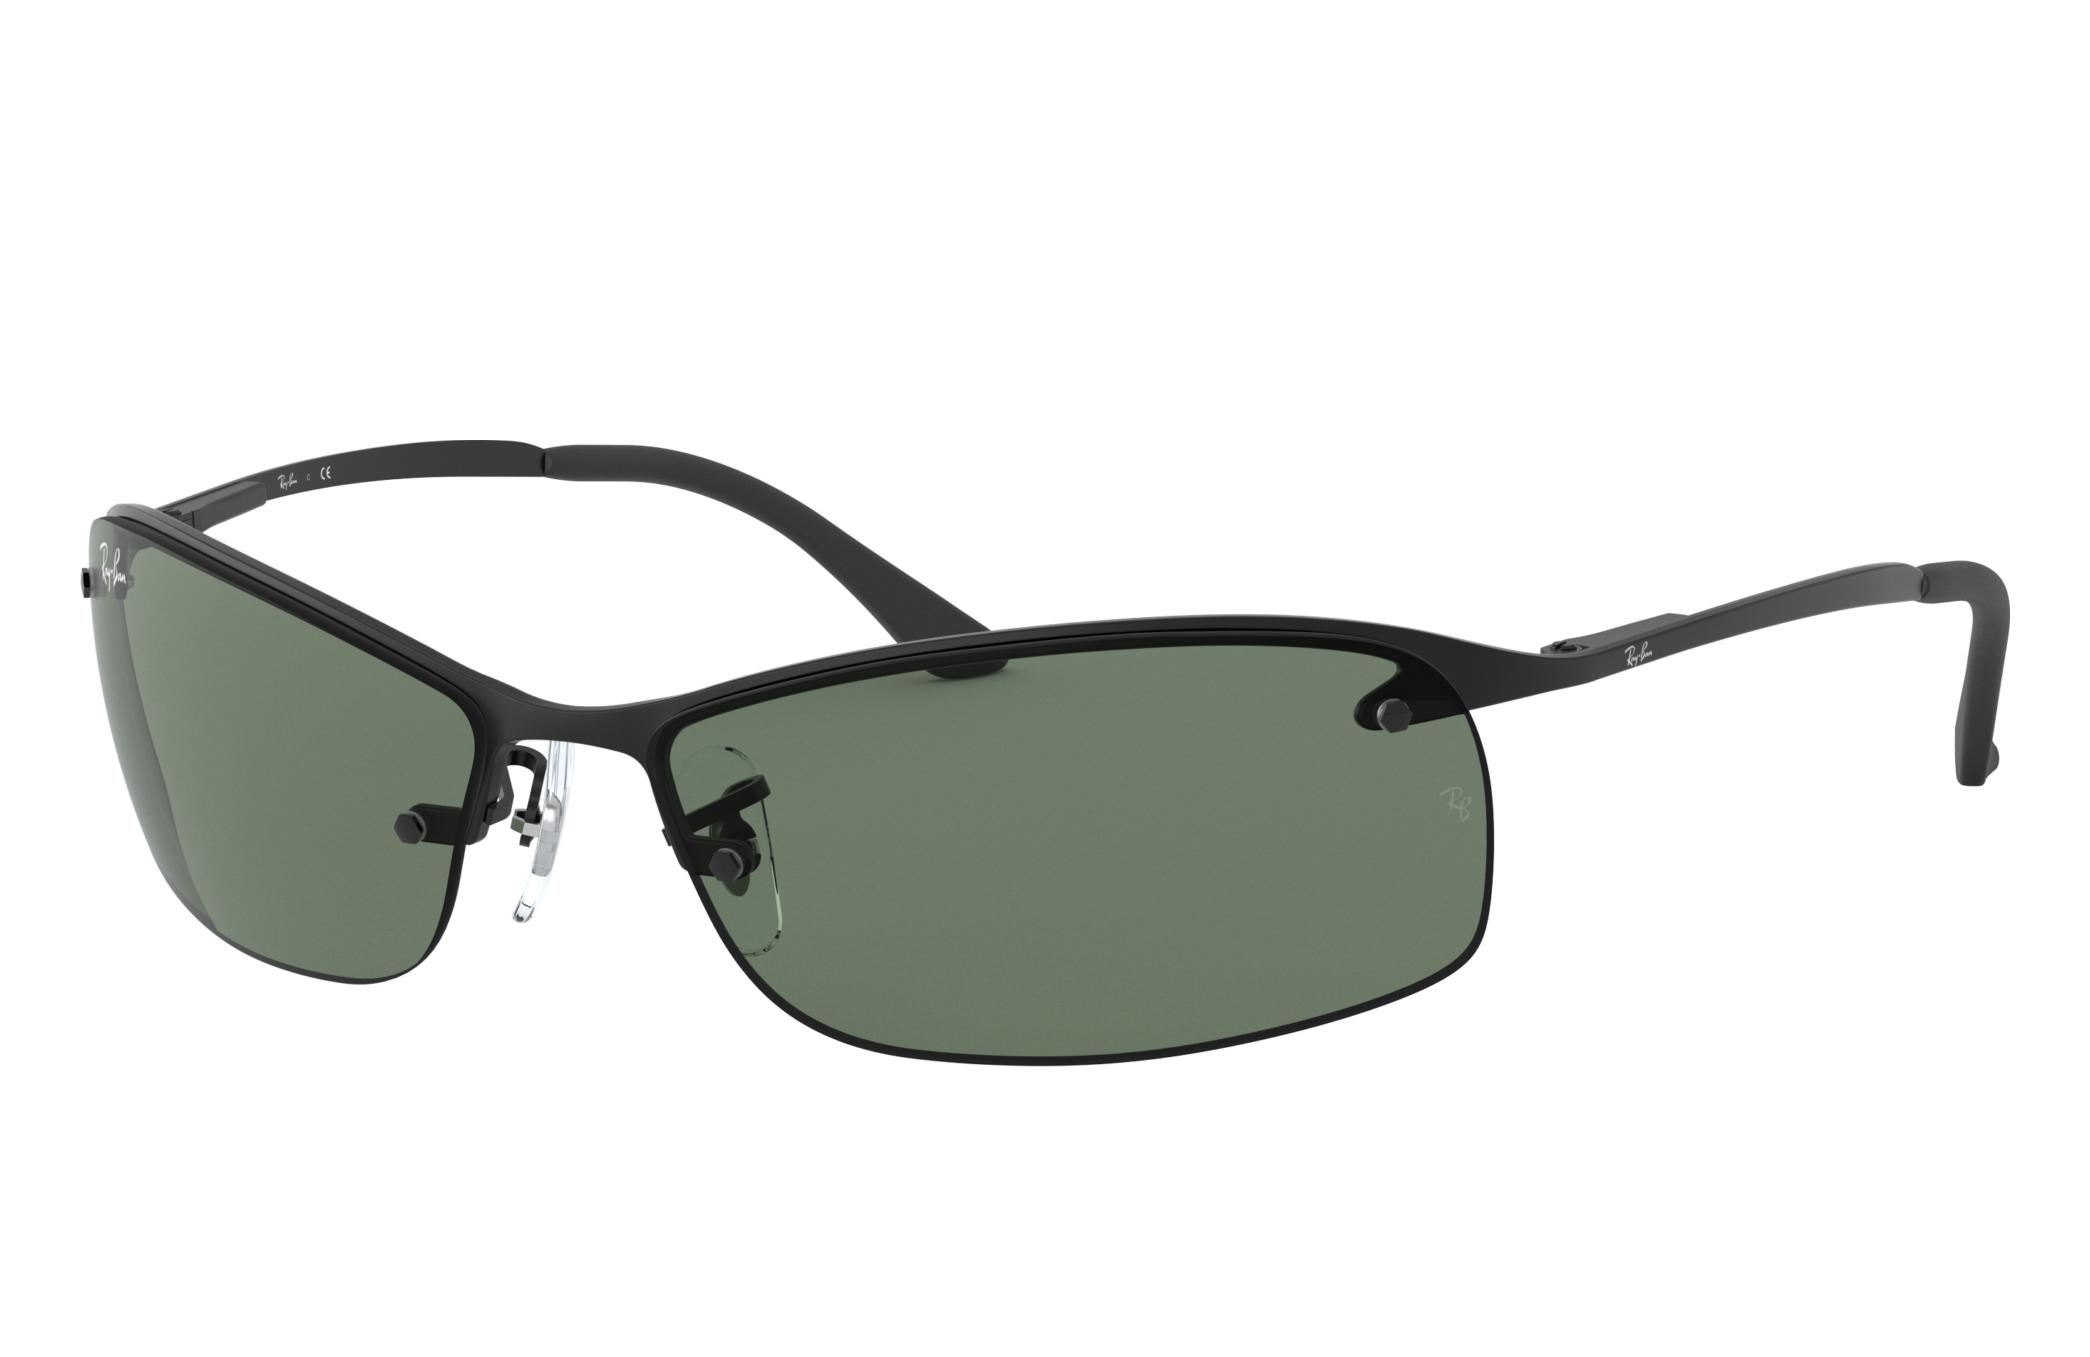 Ray-Ban Rb3183 Black, Green Lenses - RB3183